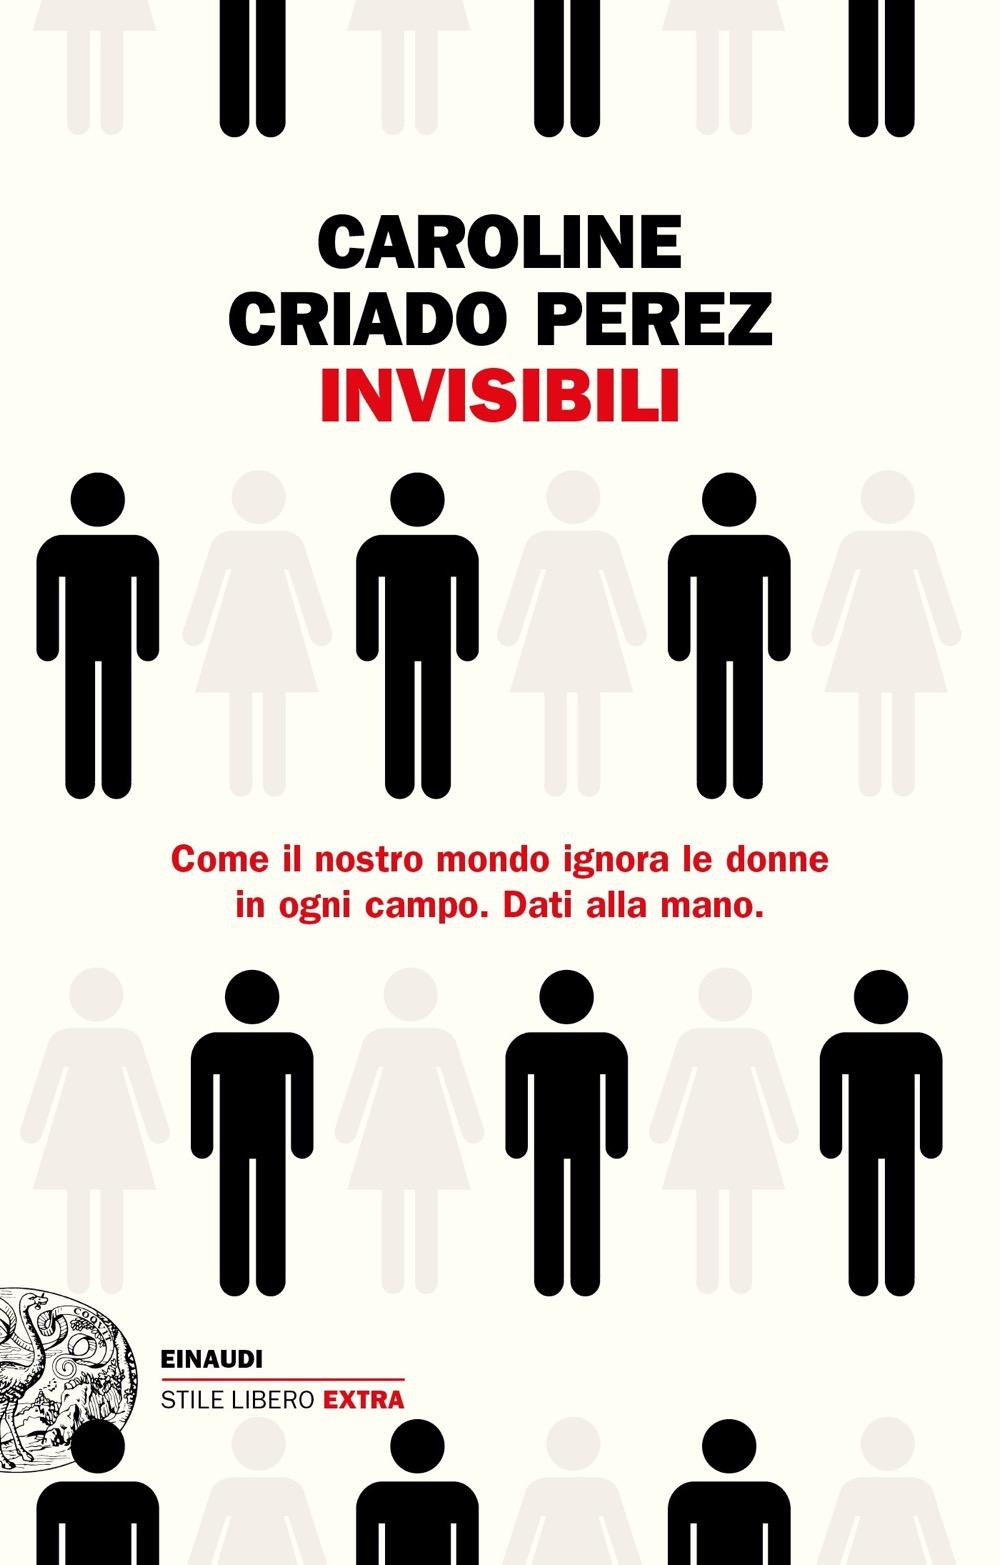 Caroline Criado Perez, Invisibili, Einaudi, 2020